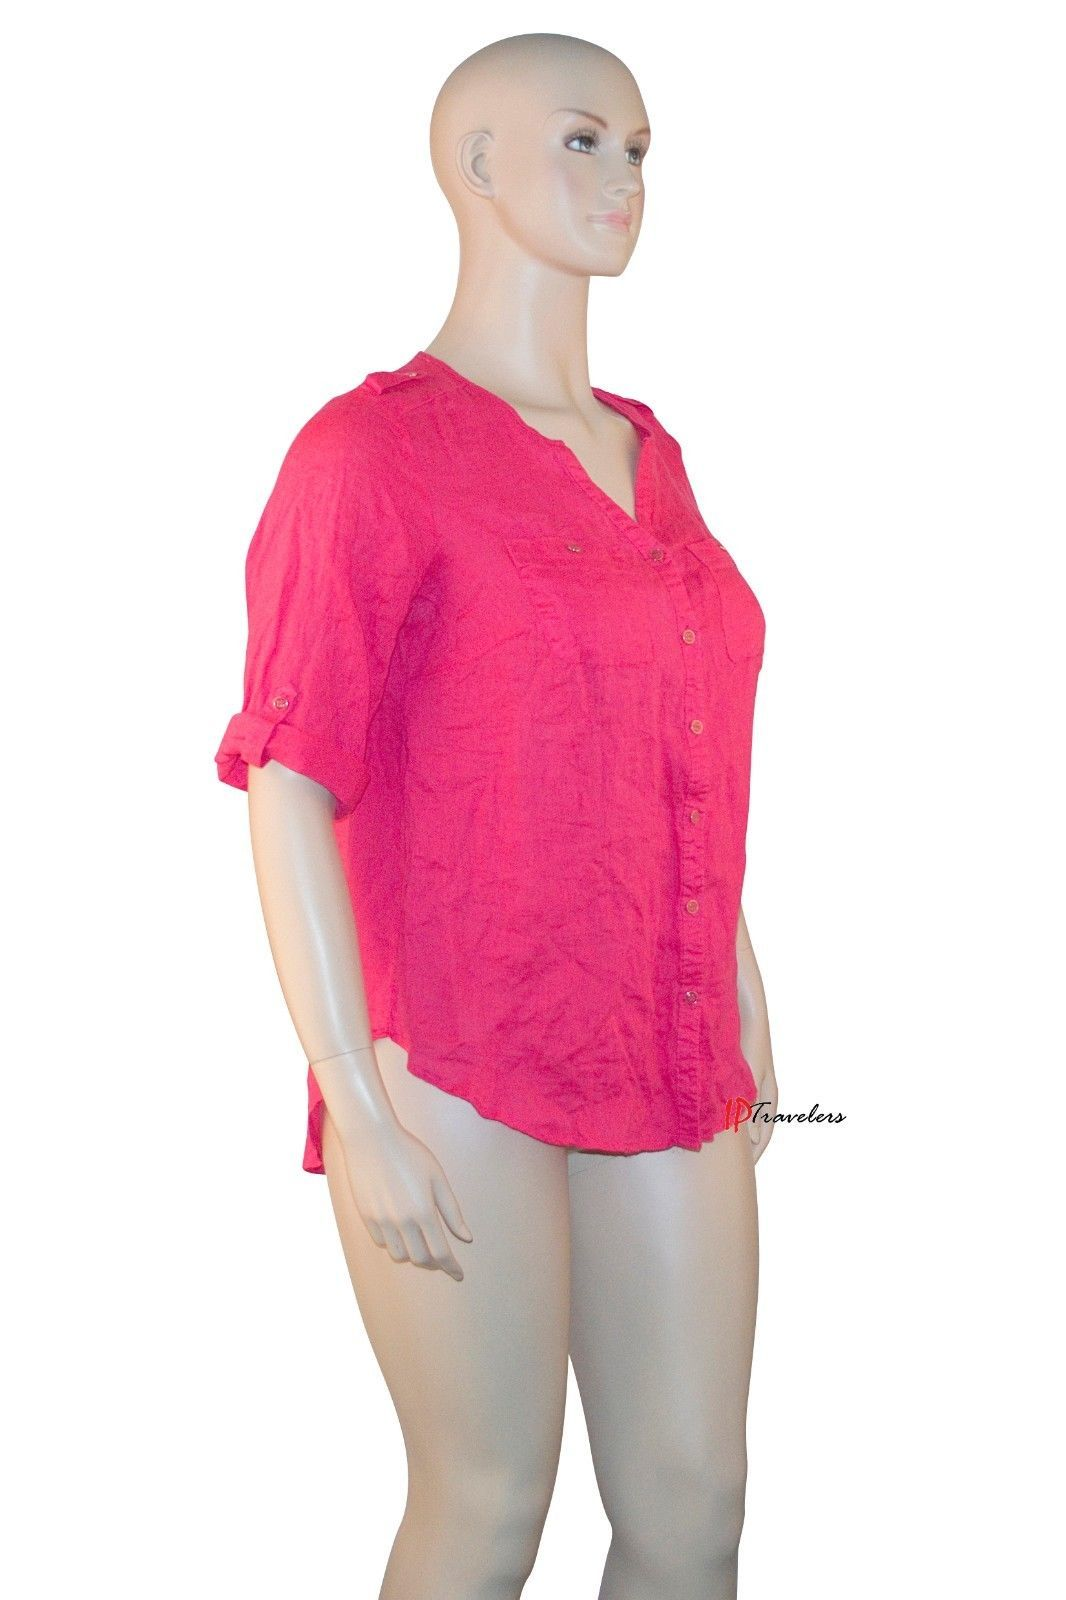 JM Collection Women's Top Blouse Plus 14W Radiant Pink 100% Linen 3/4 Sleeve $56